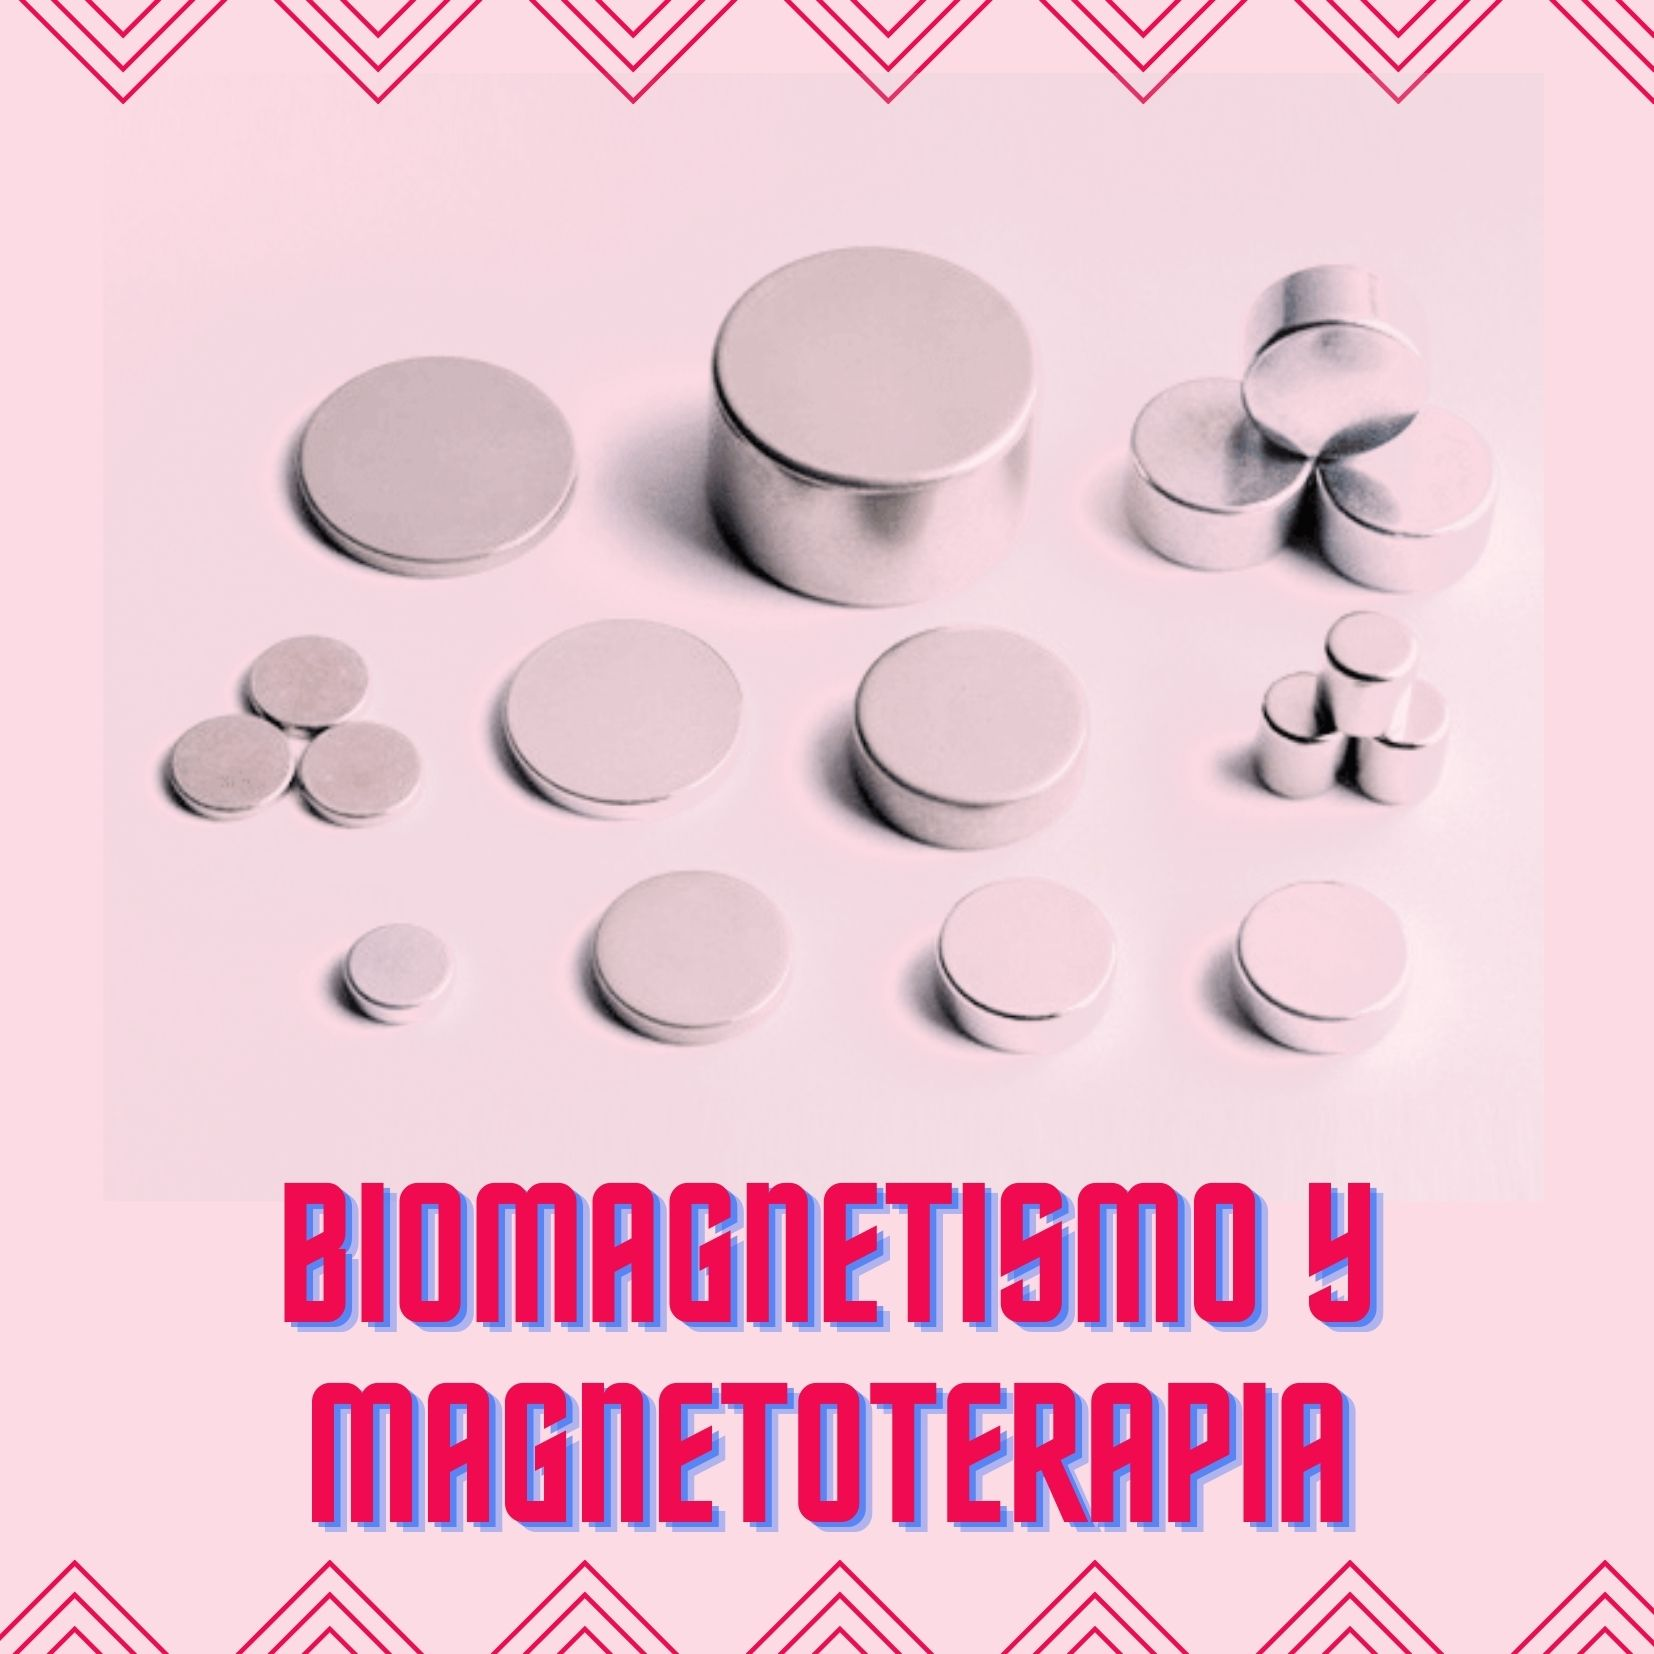 biomagnetismo y magnetoterapia